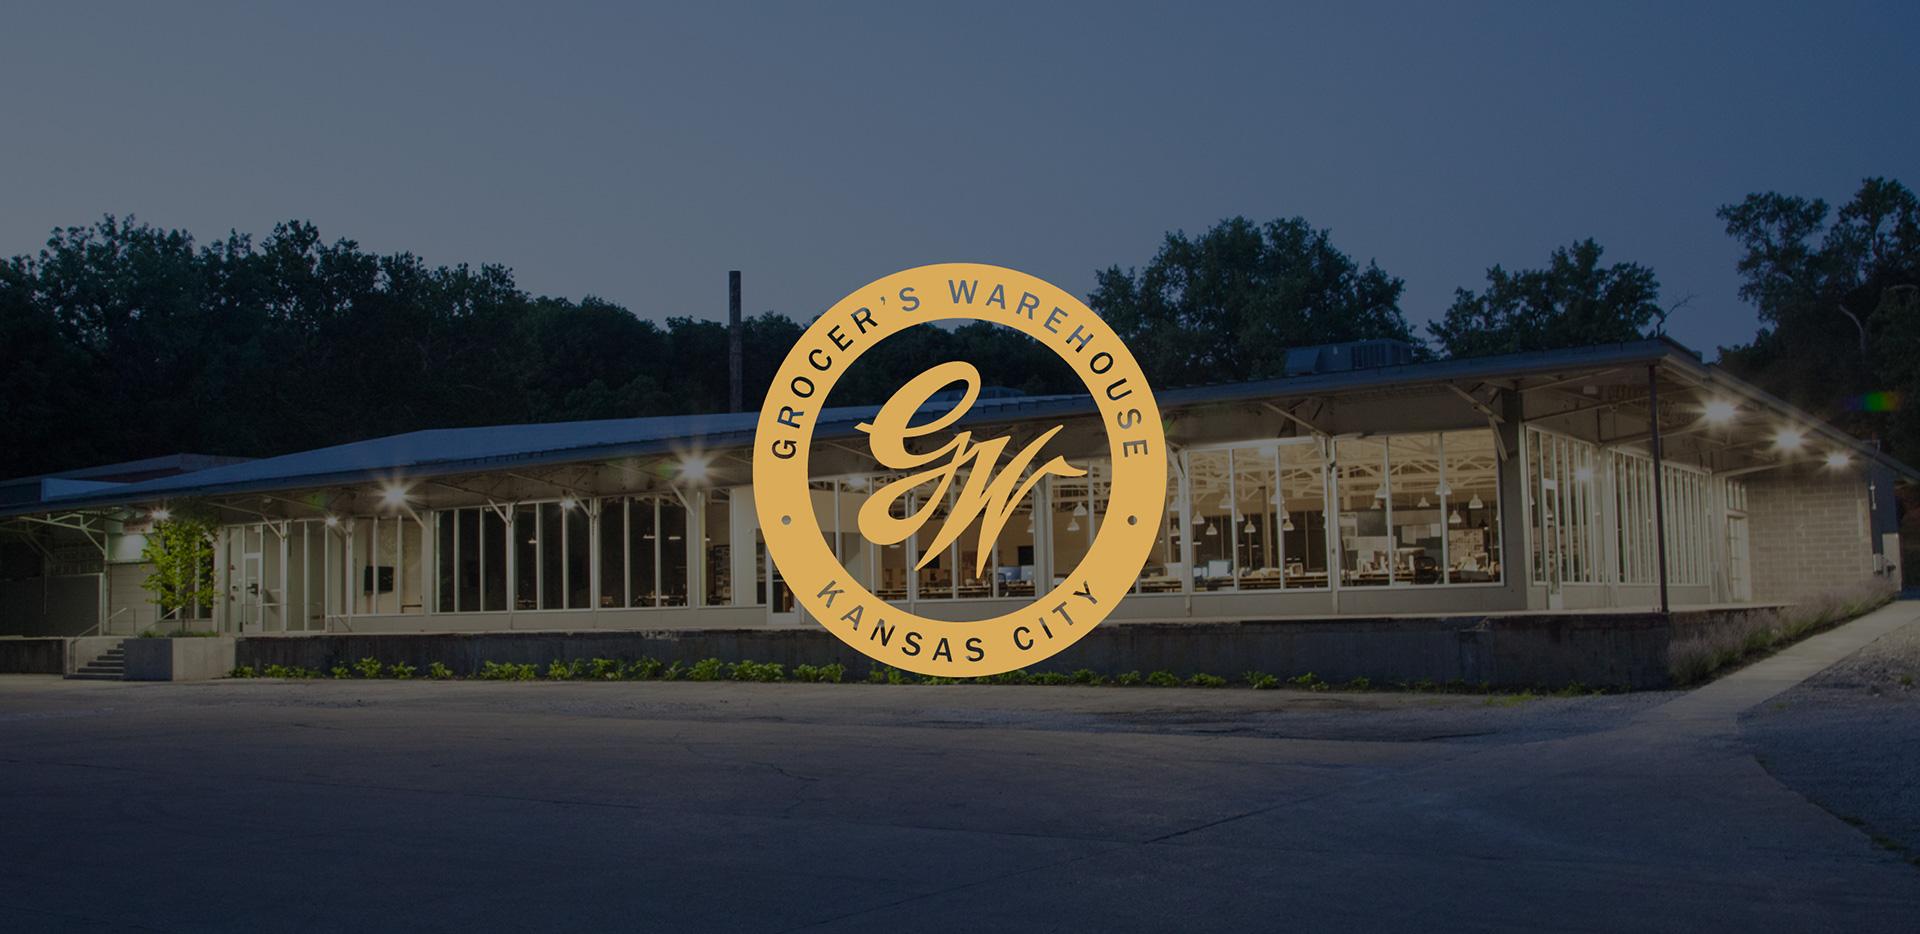 SamSmall Web-Grocers Warehouse-Building Logo Overlay